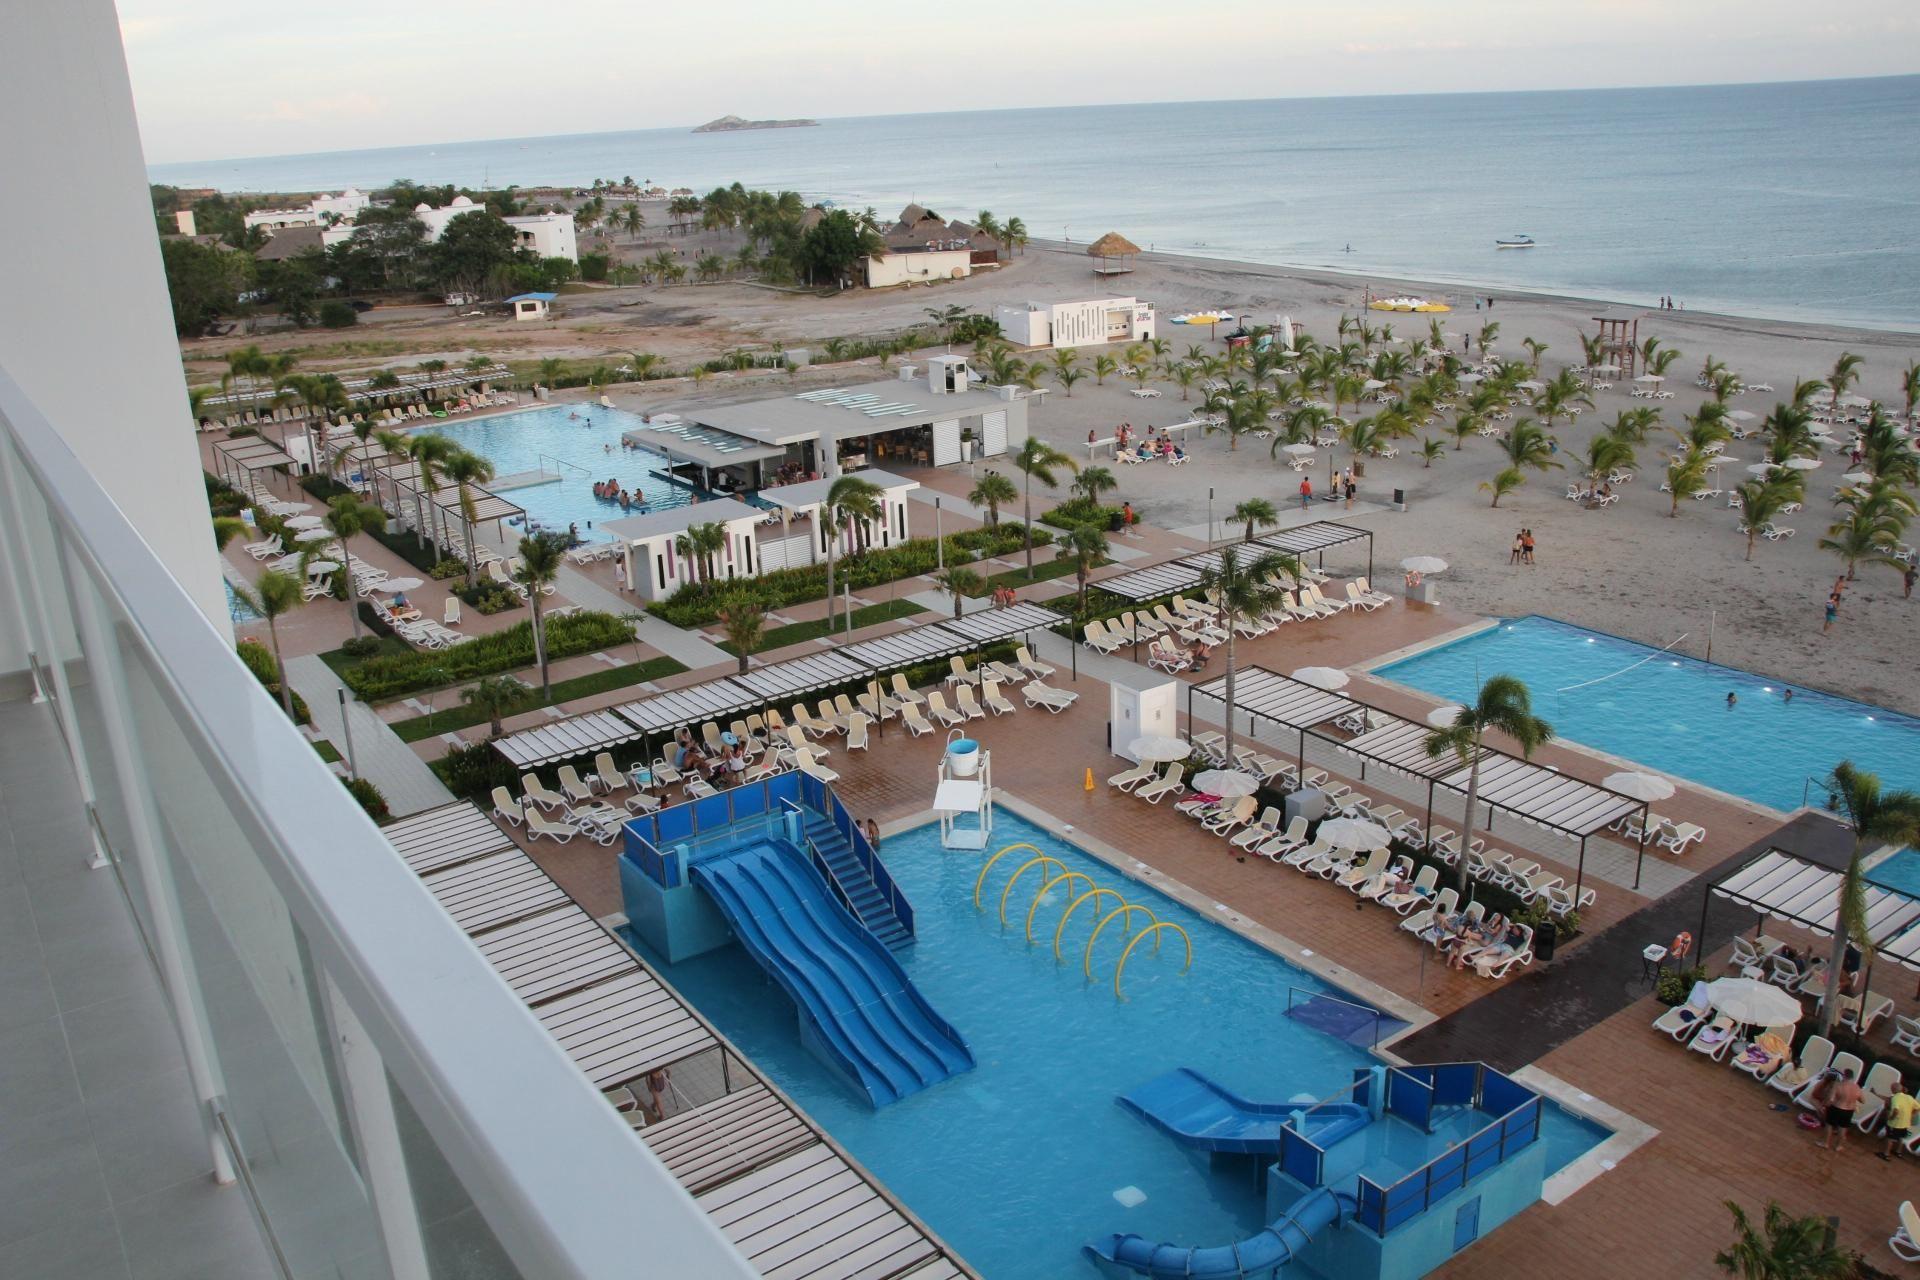 Great Stay Review Of Hotel Riu Playa Blanca Rio Hato Panama